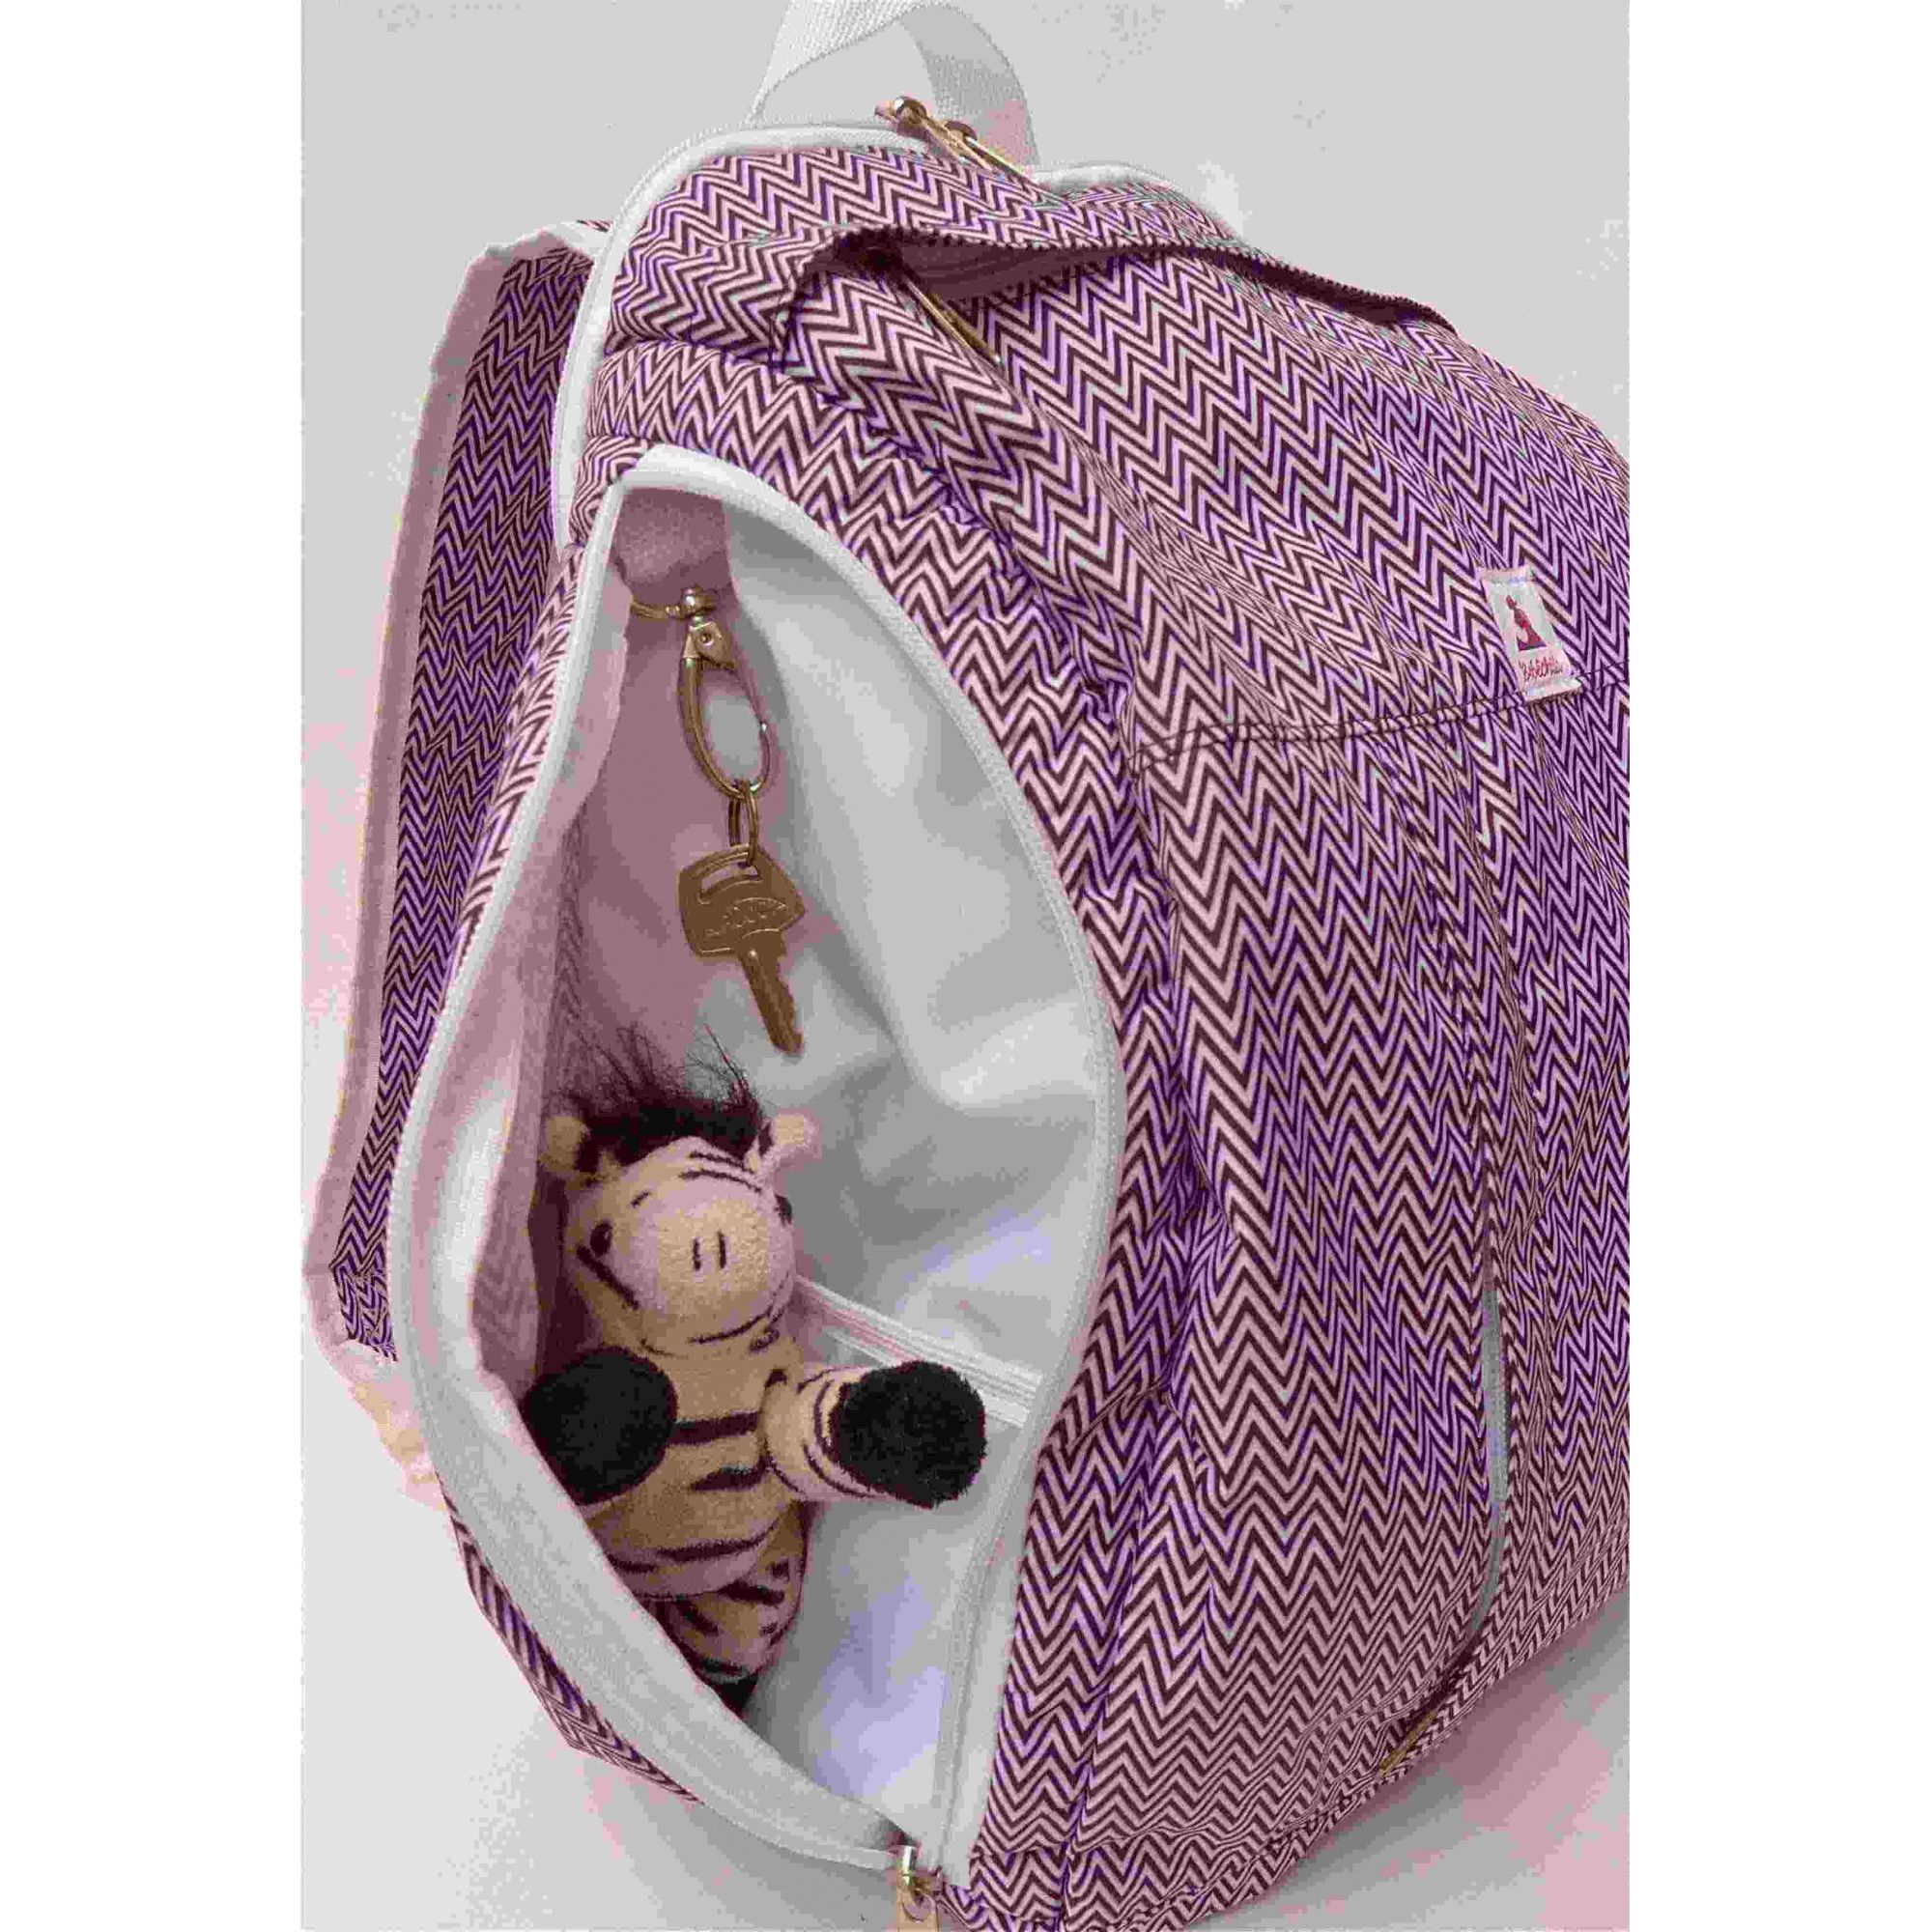 Mochila de maternidade - Bebêchila Berry Chevron Branca e Preta